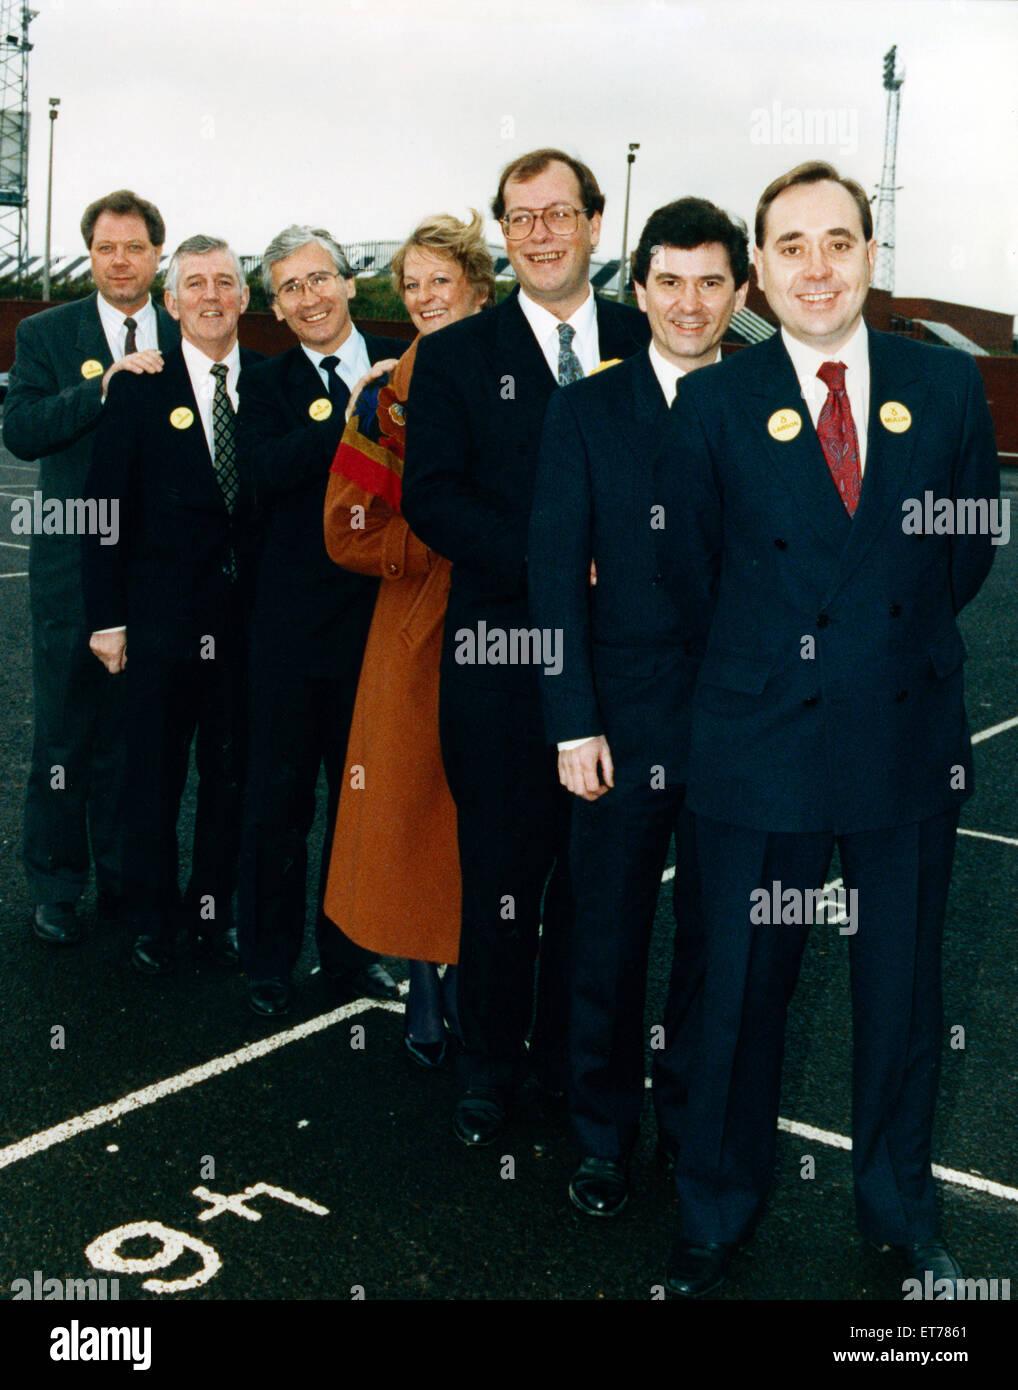 Alex Salmond circa 1990s. - Stock Image